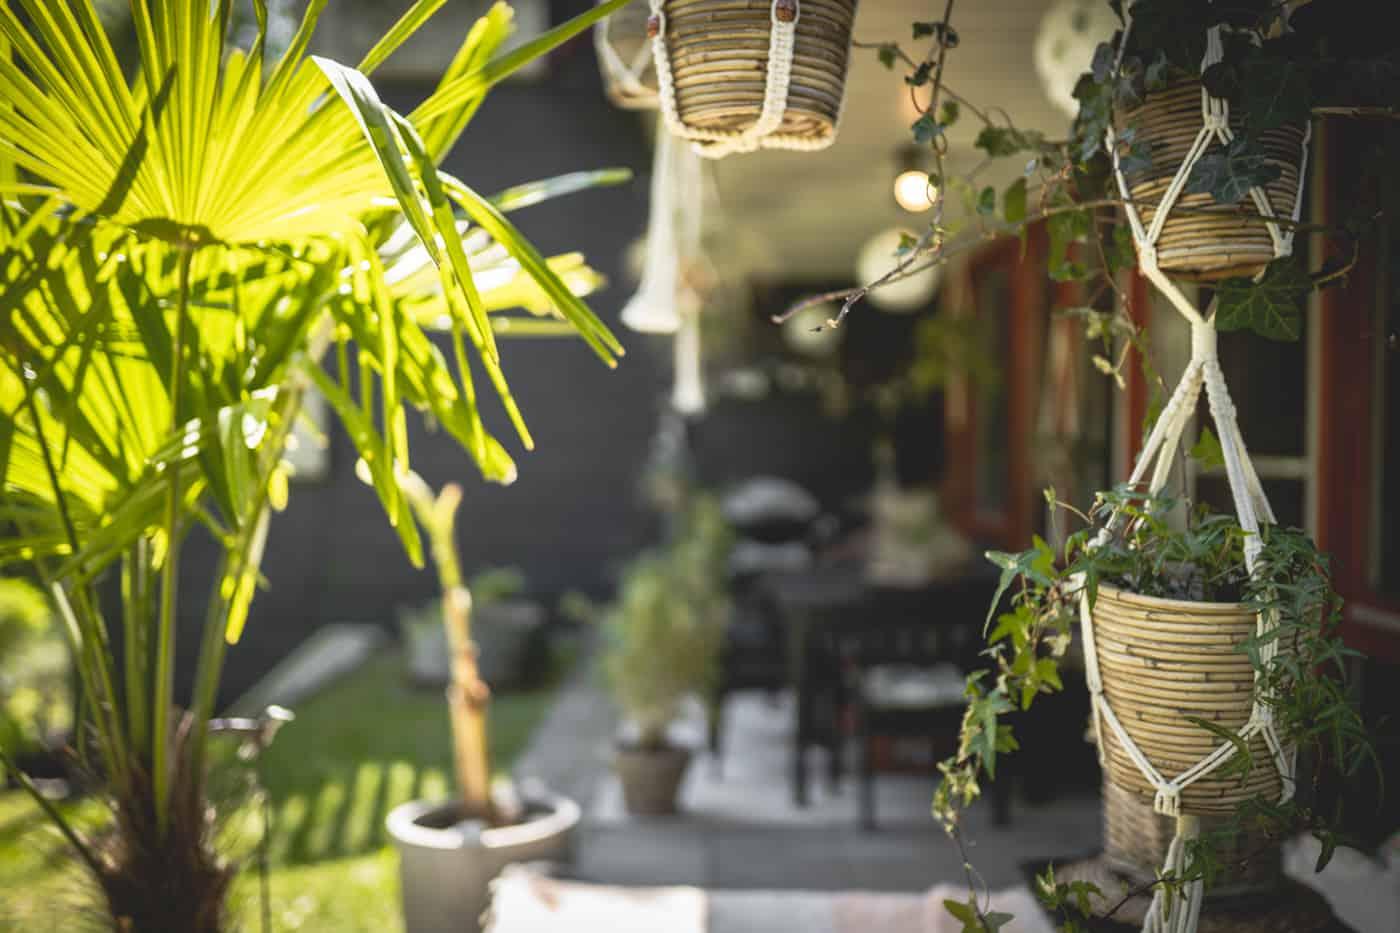 Dschungel Balkon / Terrasse: Winterharte Pflanzen & Tipps